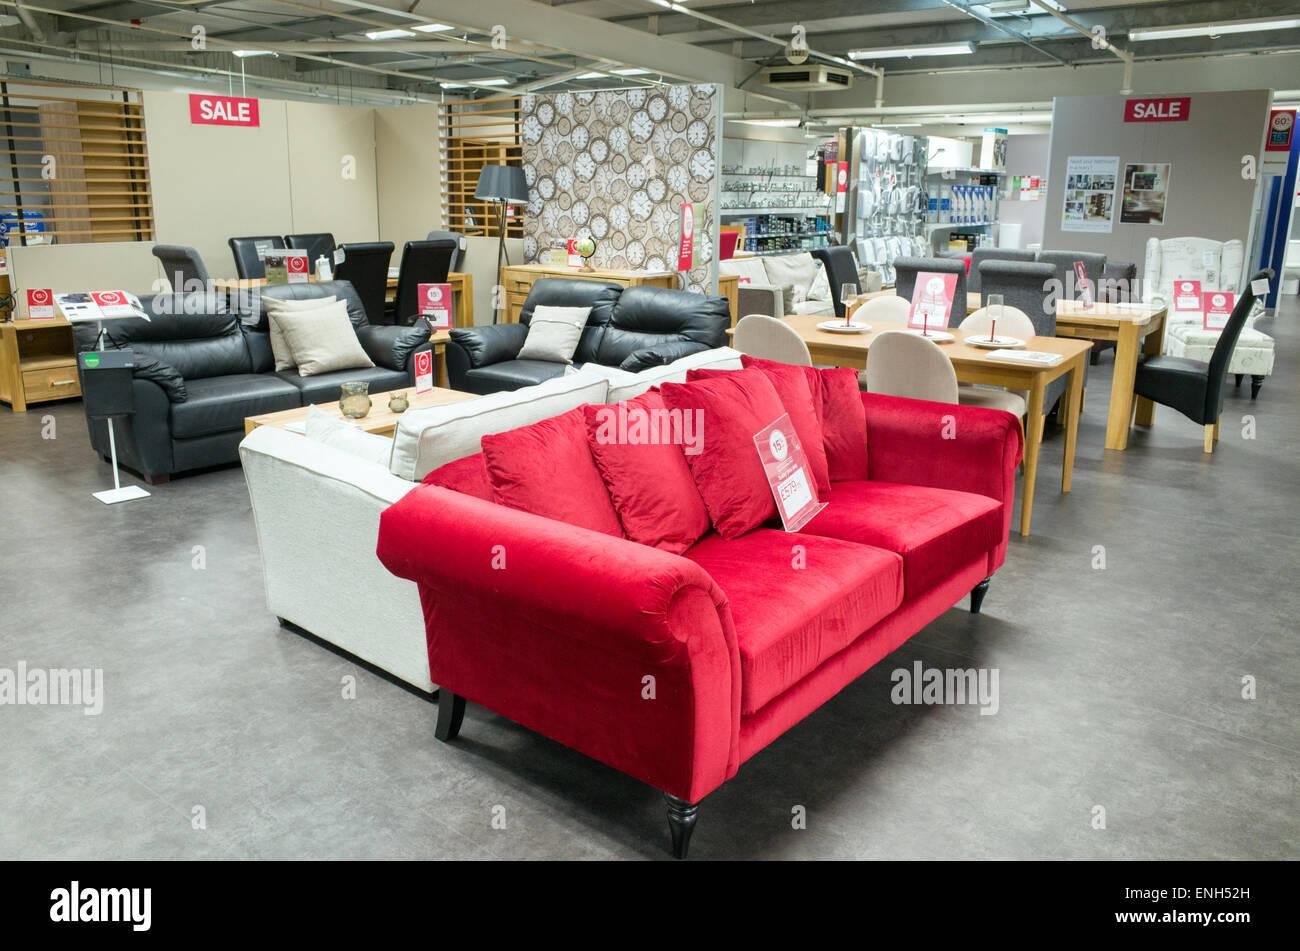 New Sofas In Homebase Store England Uk Stock Photo 82126425 Alamy